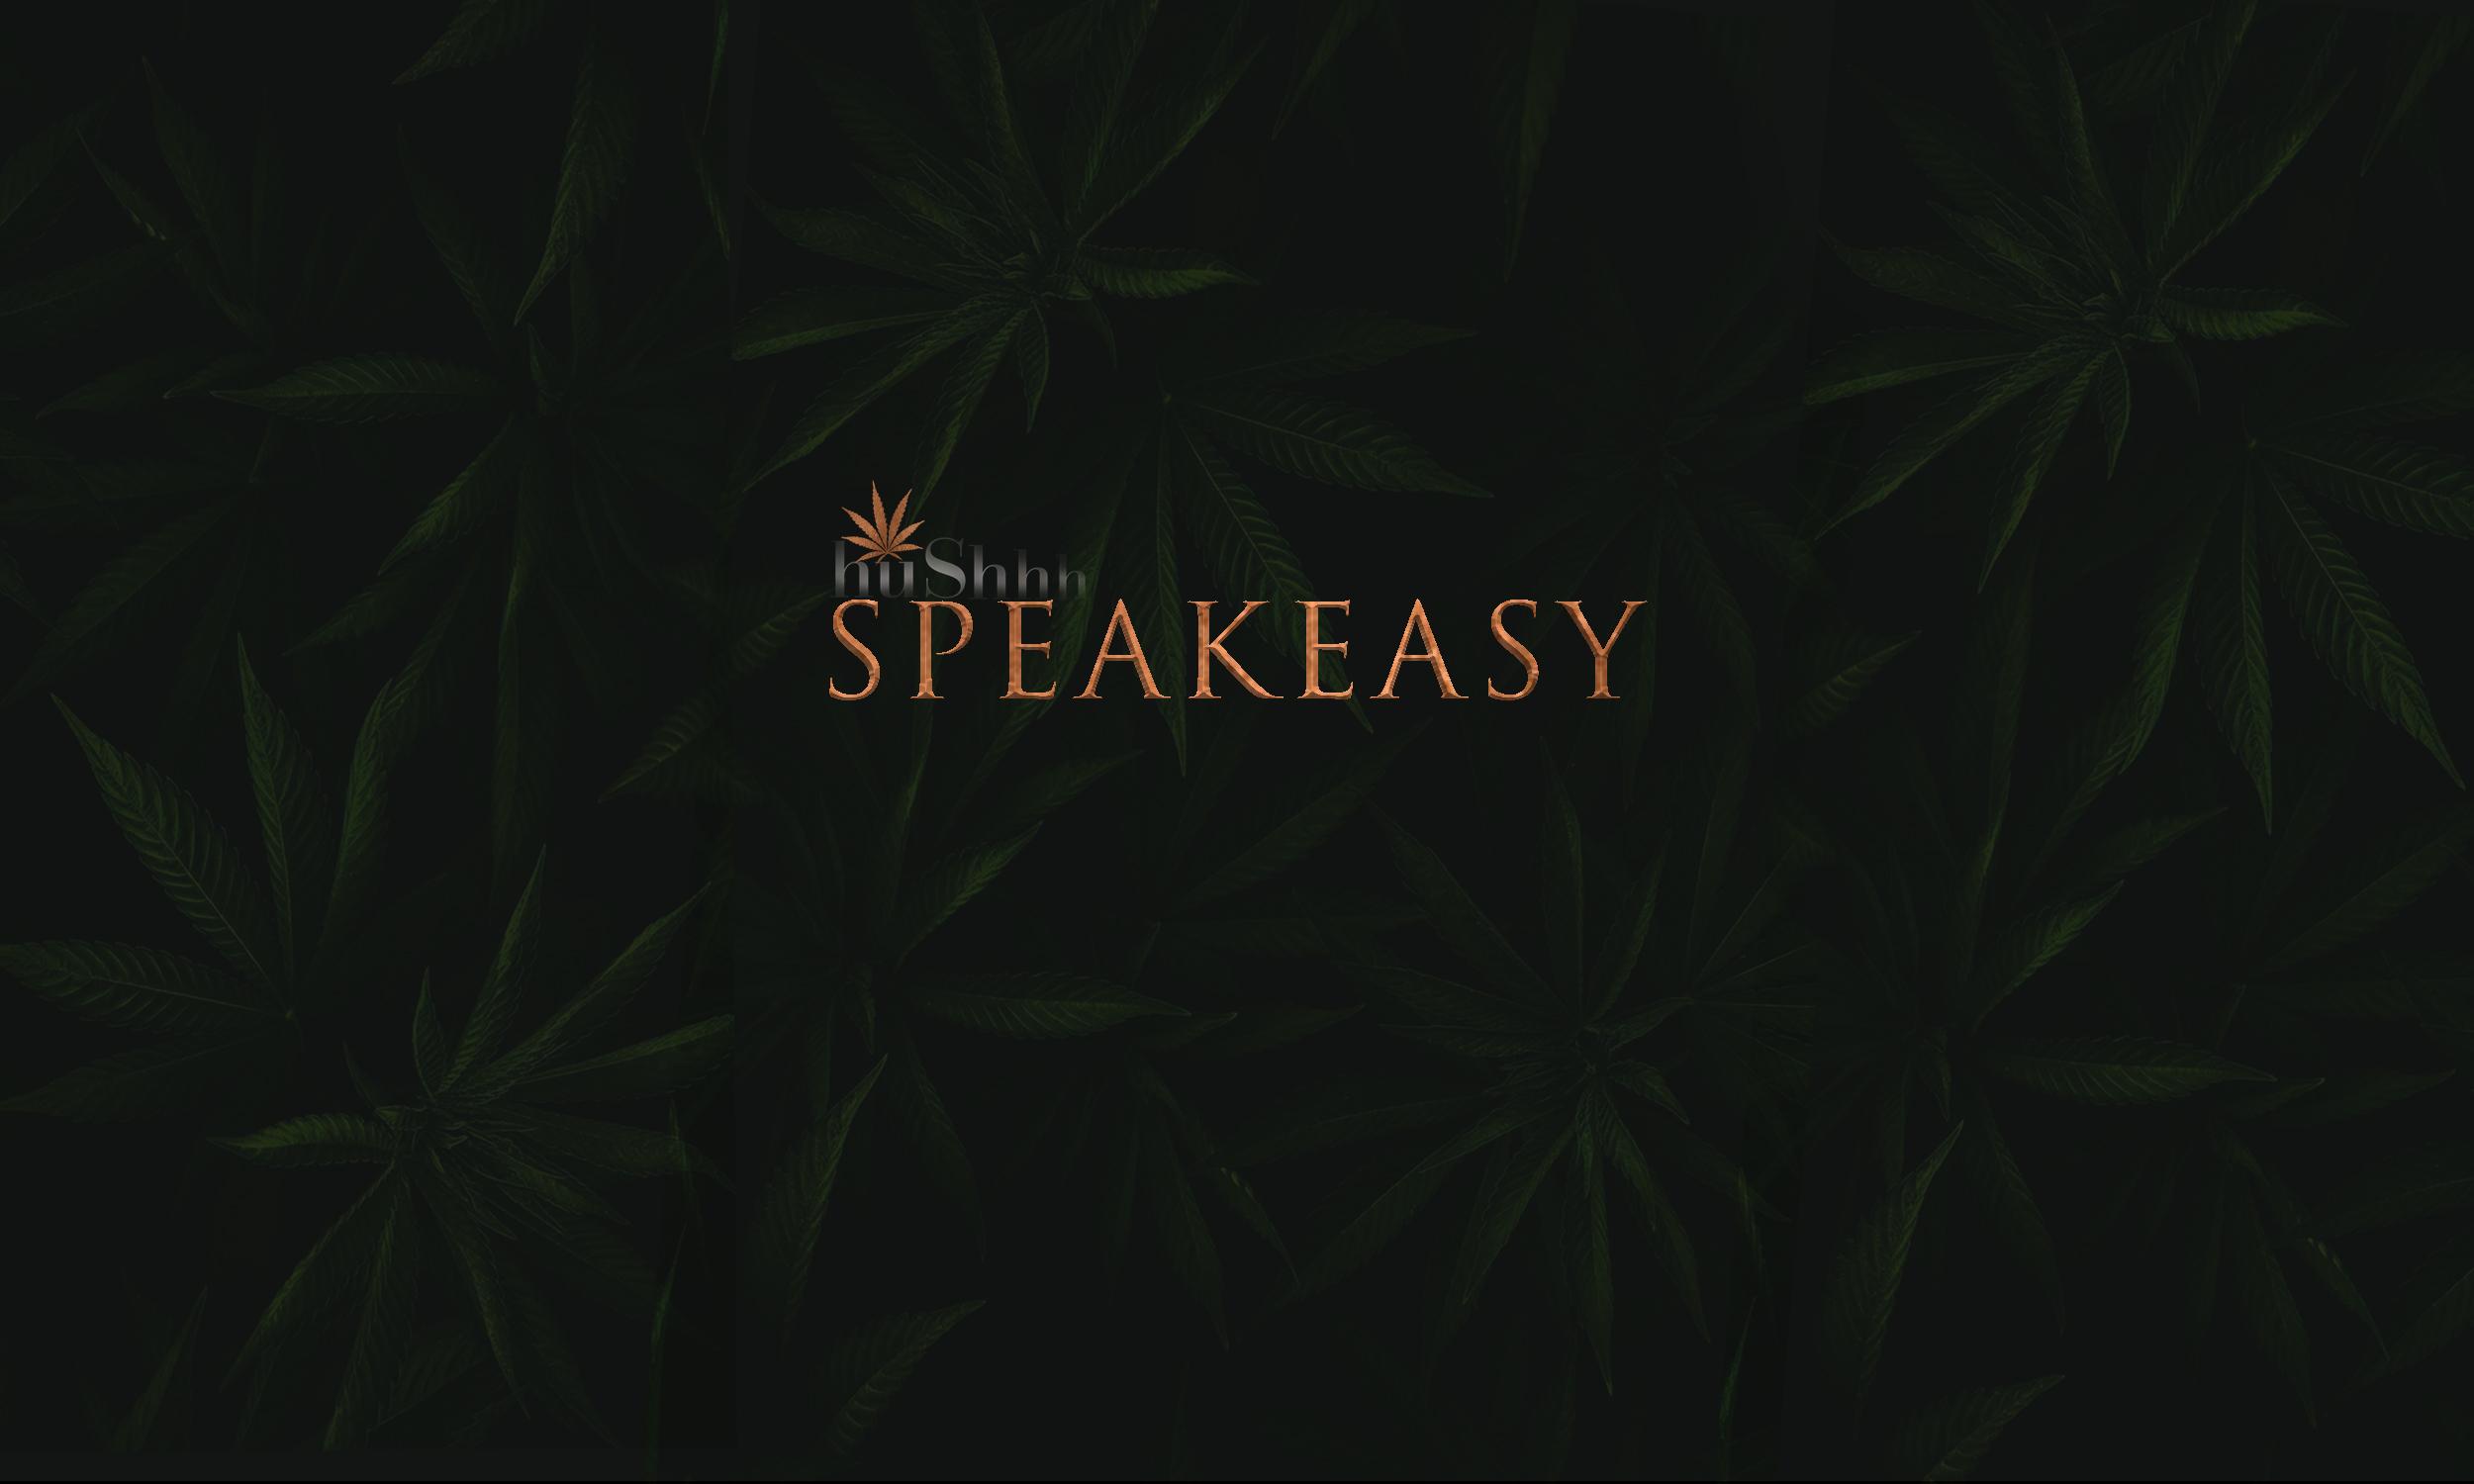 huShhh Speakeasy